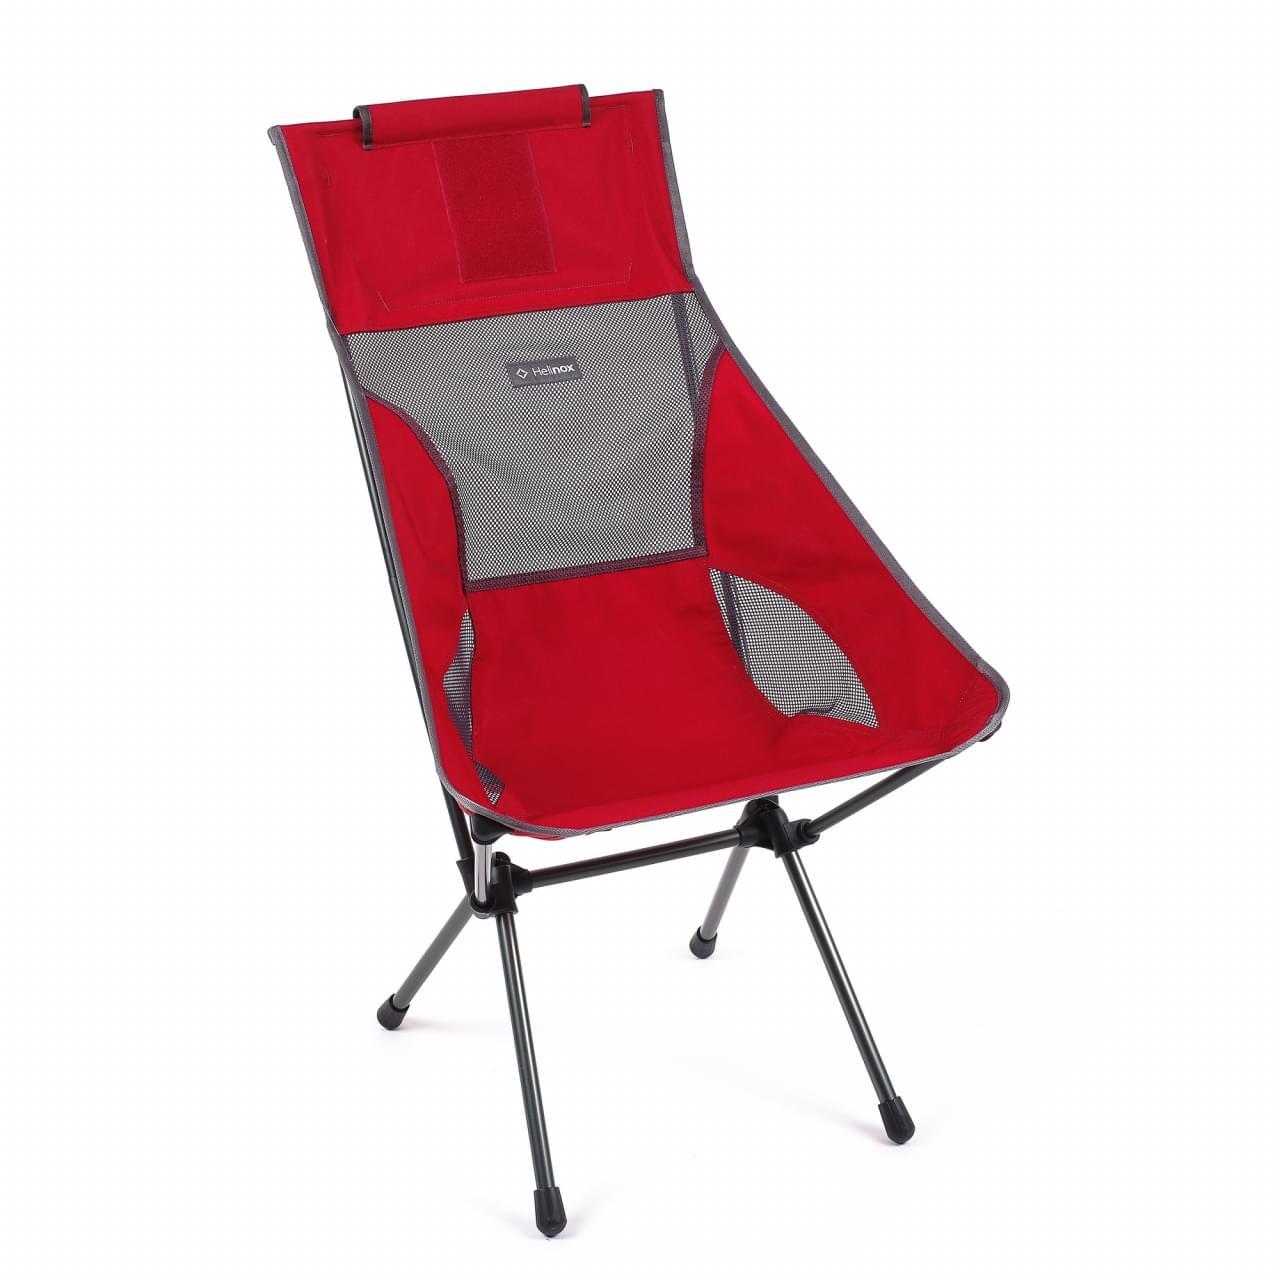 Helinox Sunset Chair Lichtgewicht Stoel Rood